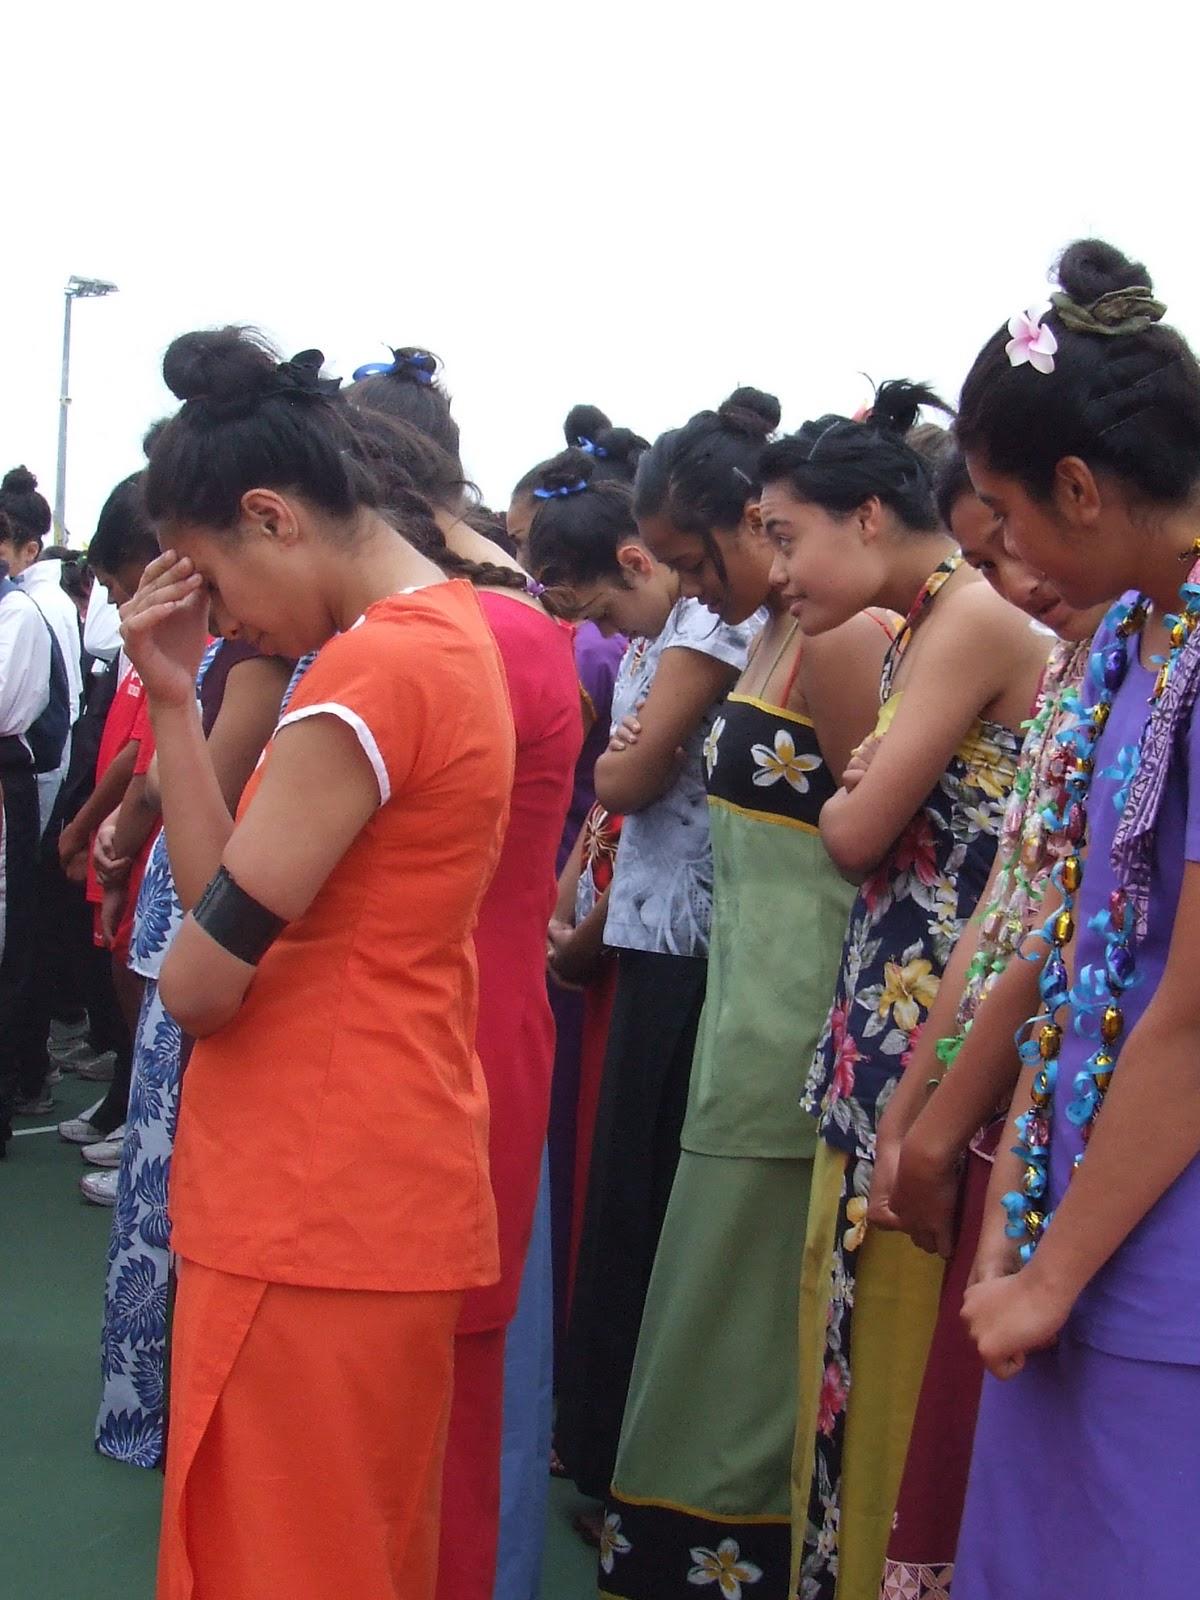 Samoan Puletasi Dresses